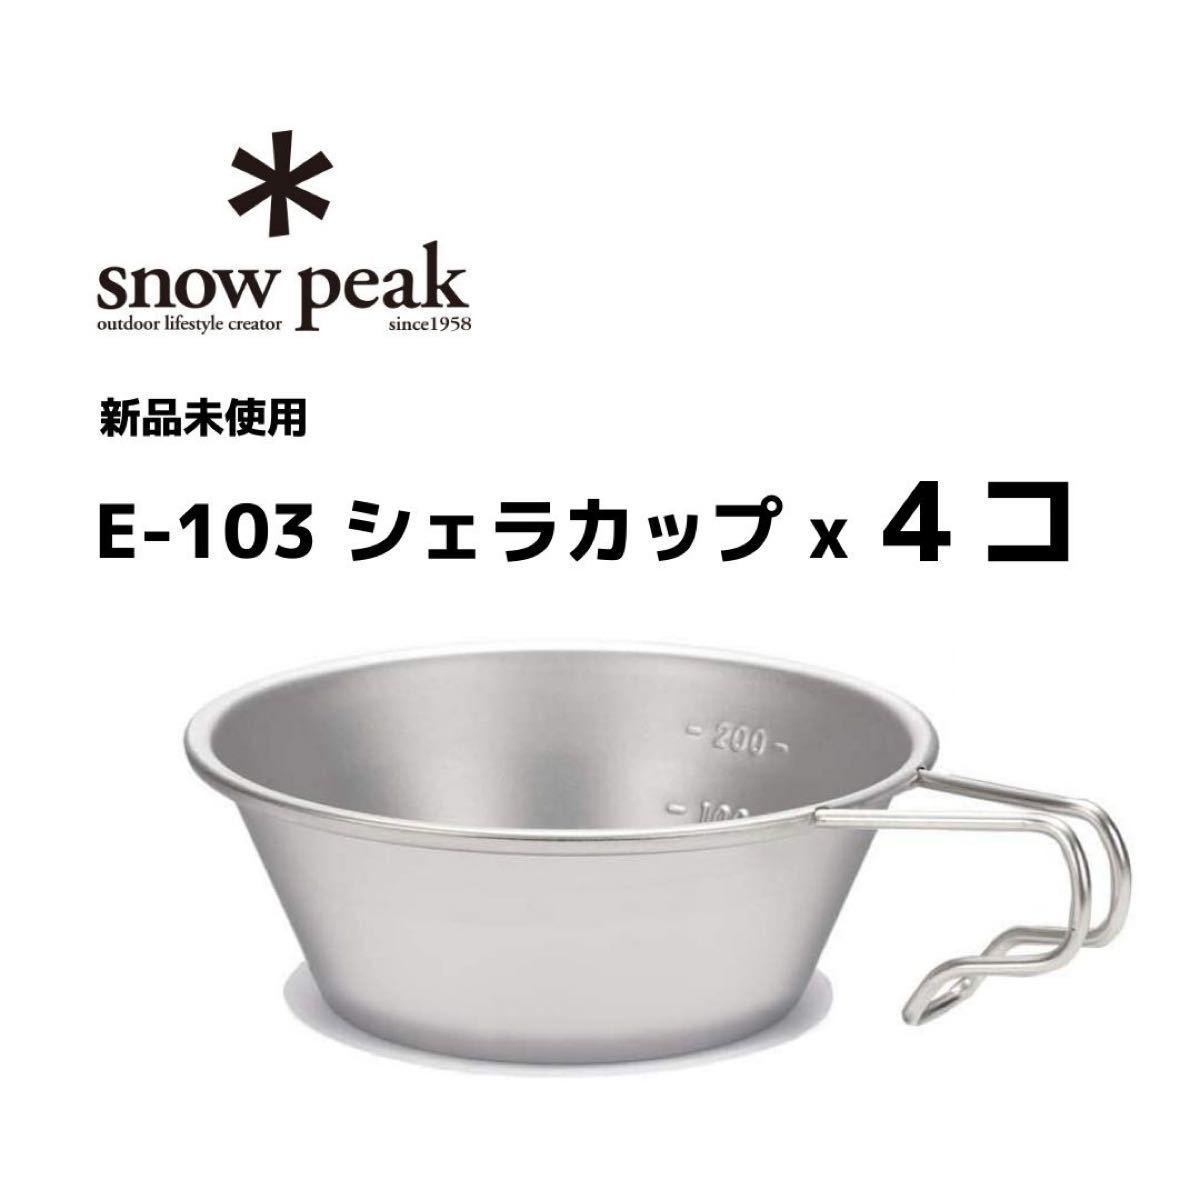 snow peak  スノーピーク シェラカップ E-103 4個セット